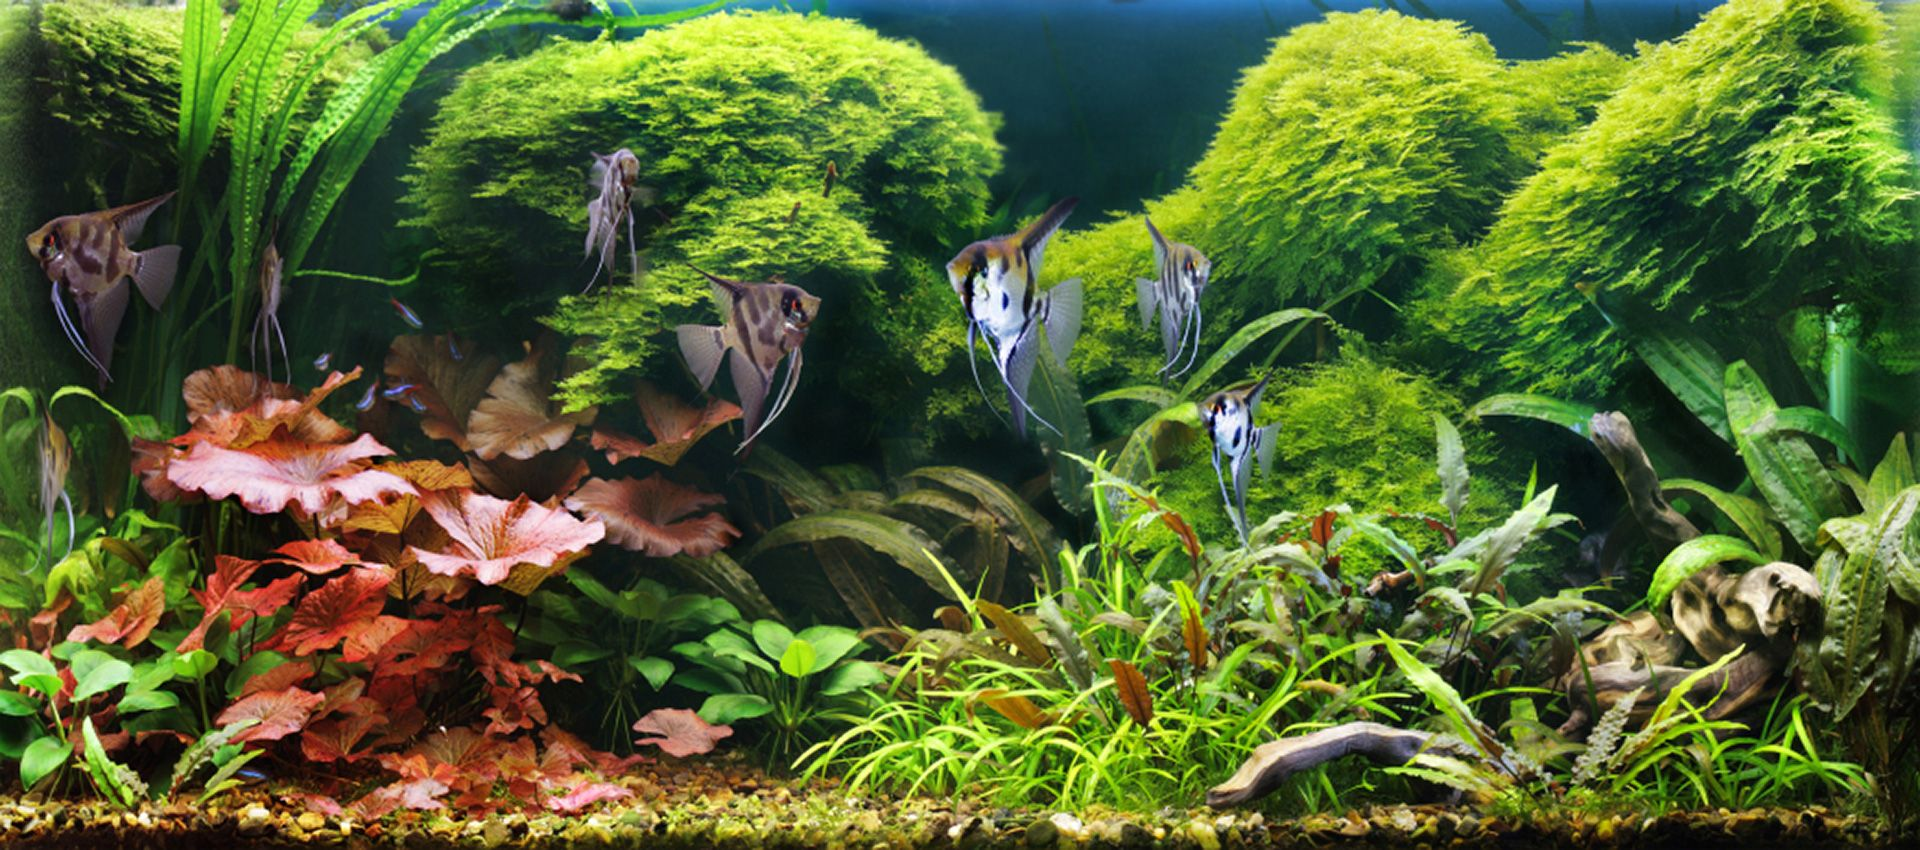 Large Freshwater Aquariums Stocked With Fish NYC Okeanos Aquascaping